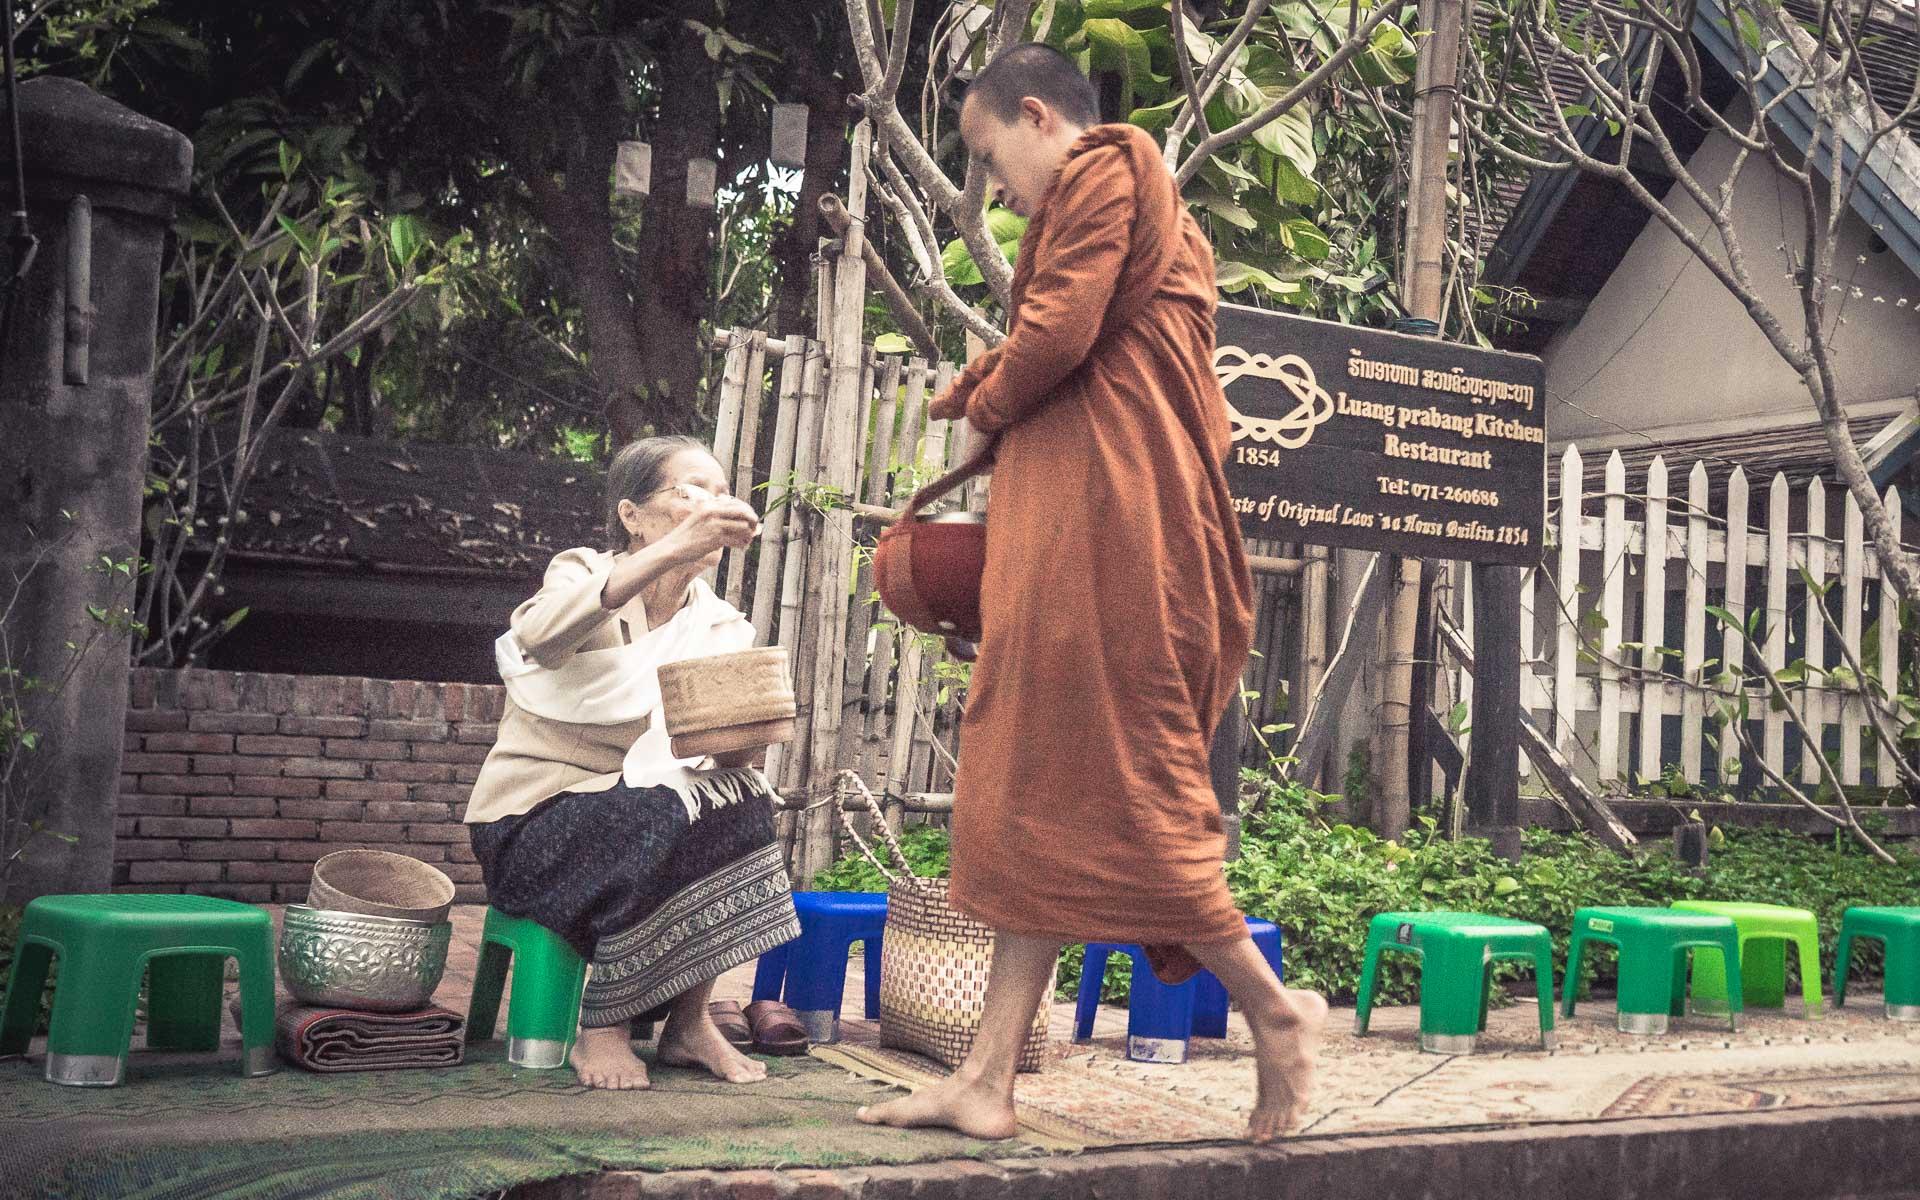 Lesvoyageuses-voyage-laos-luang-prabang-ceremonie-offrandes-13